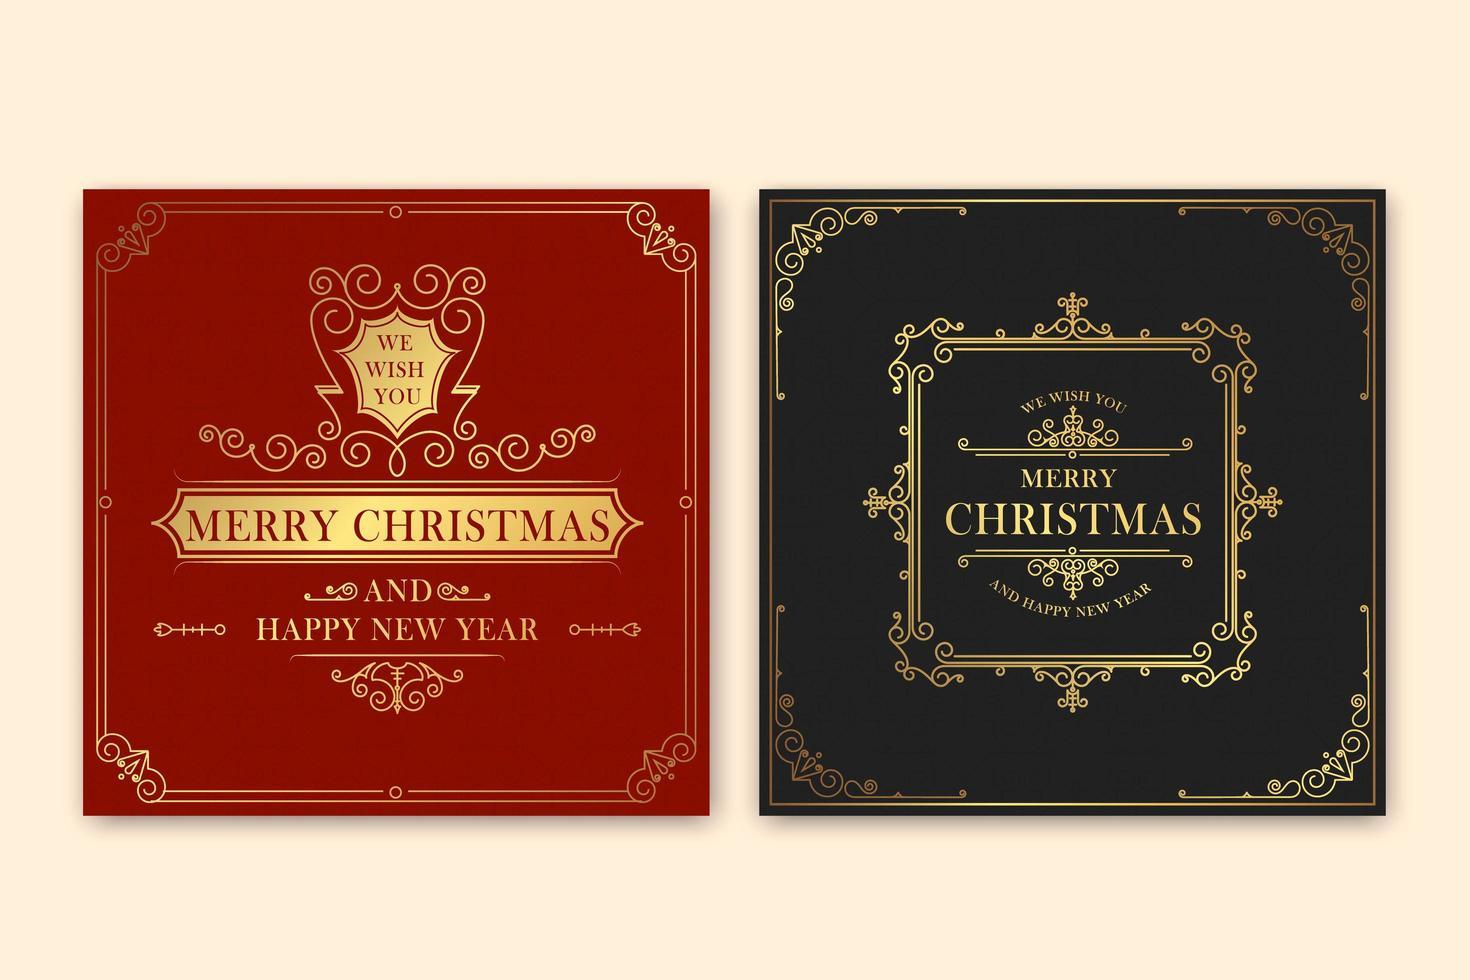 Vintage Merry Christmas greeting card vector